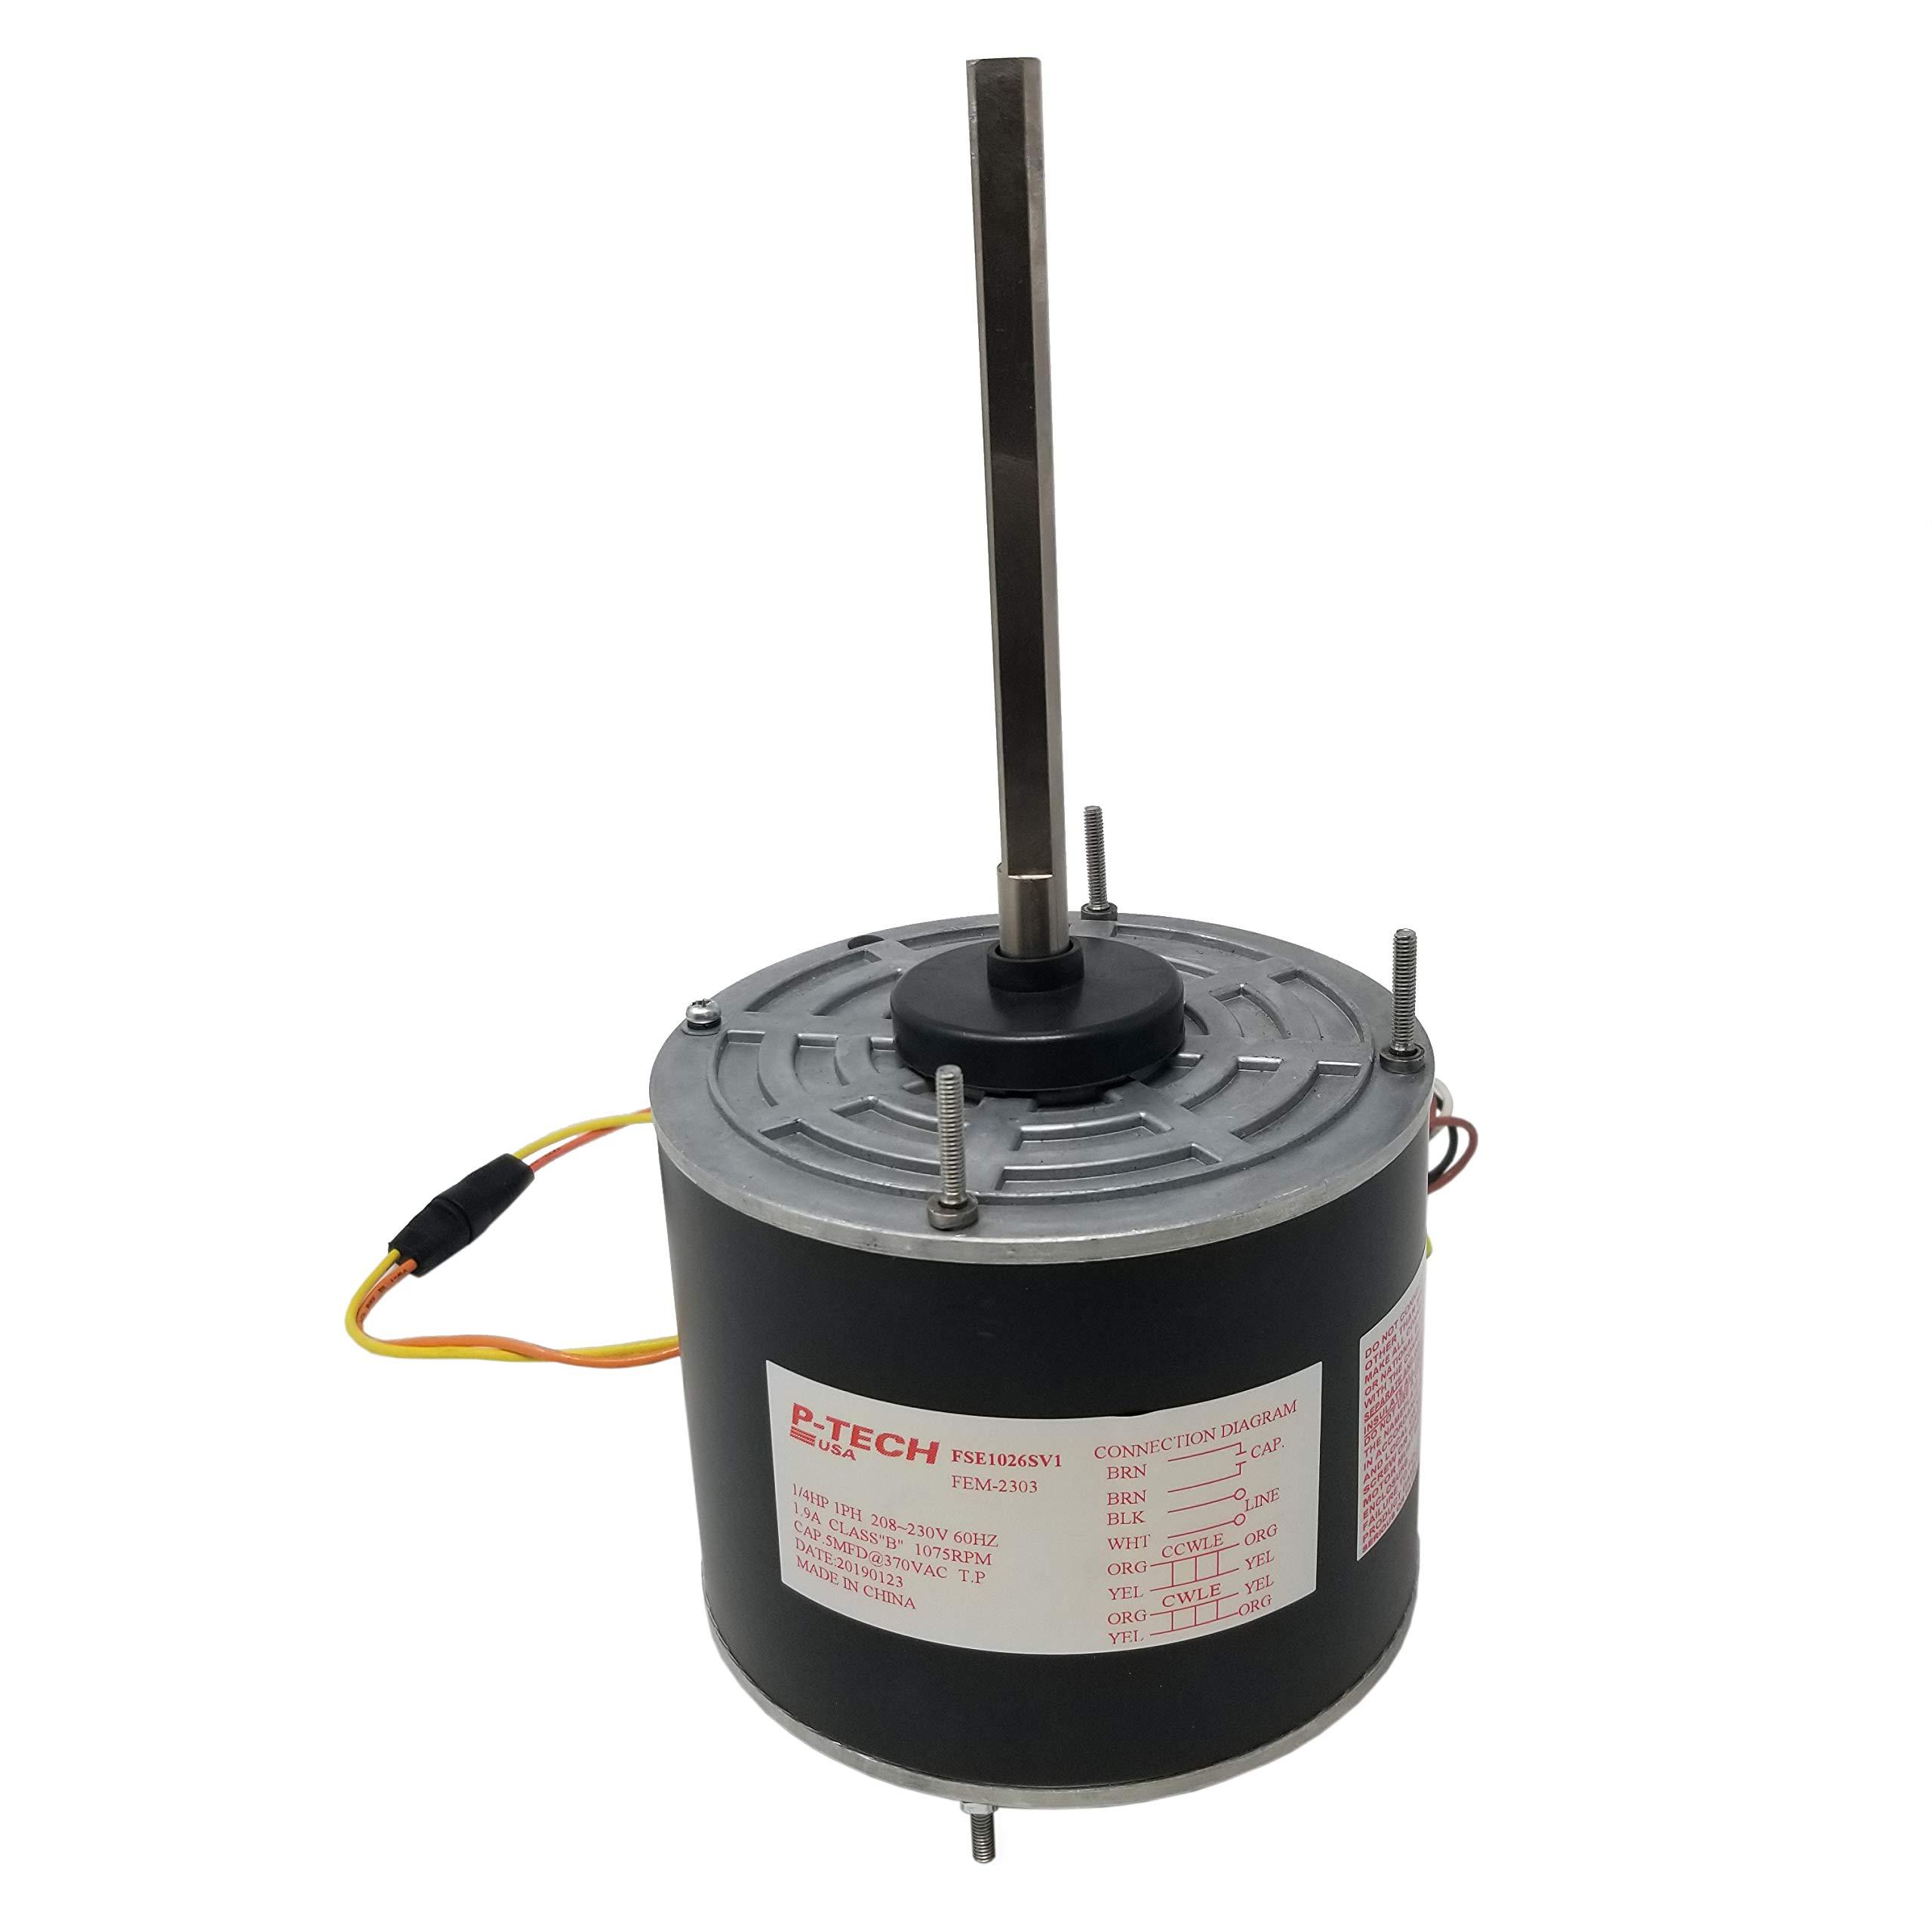 48 Frame Condenser Motor | Replaces: A.O. Smith FSE1026SV1 by P-Tech (Image #1)